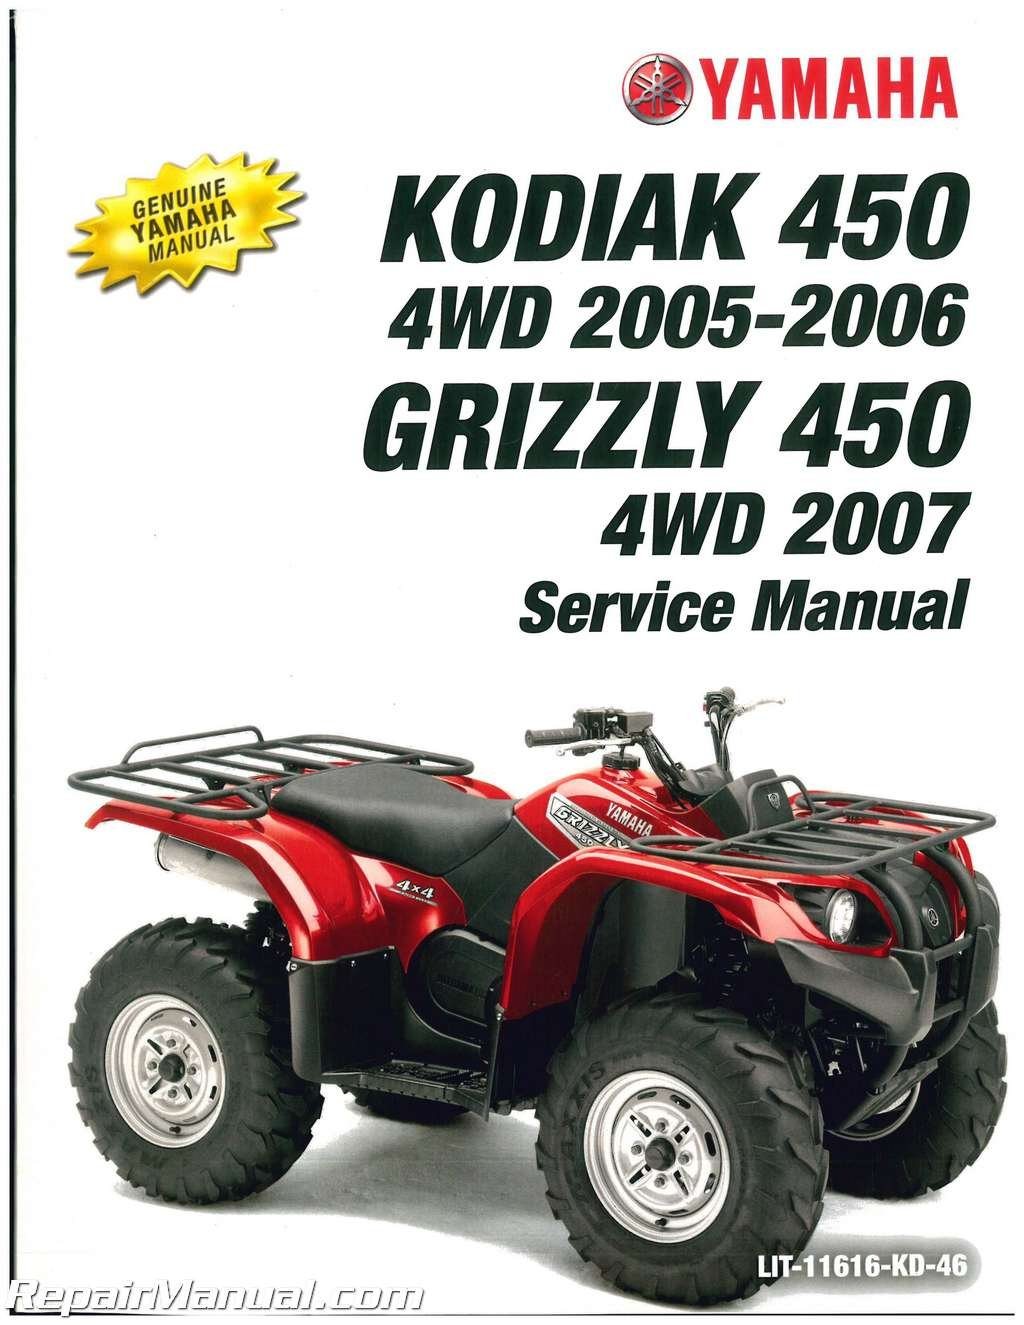 LIT-11616-KD-46 2003-2006 Yamaha Kodiak 450 4WD 2007 Grizzly